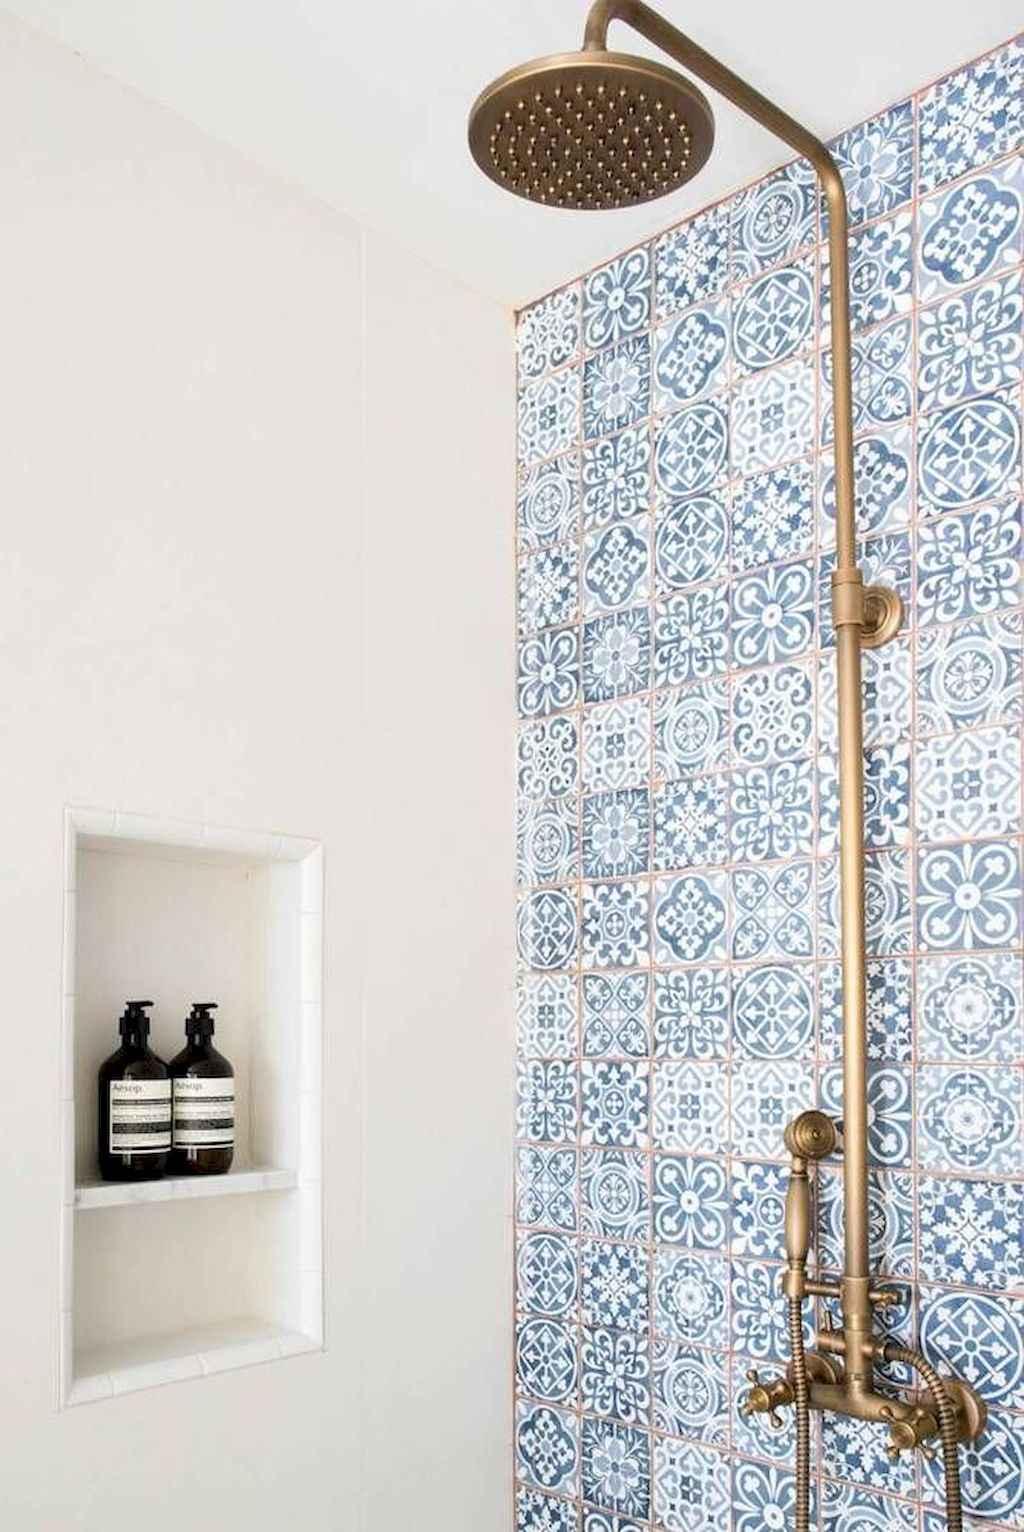 50 beautiful bathroom shower tile ideas - Bathroom tile ideas pictures ...